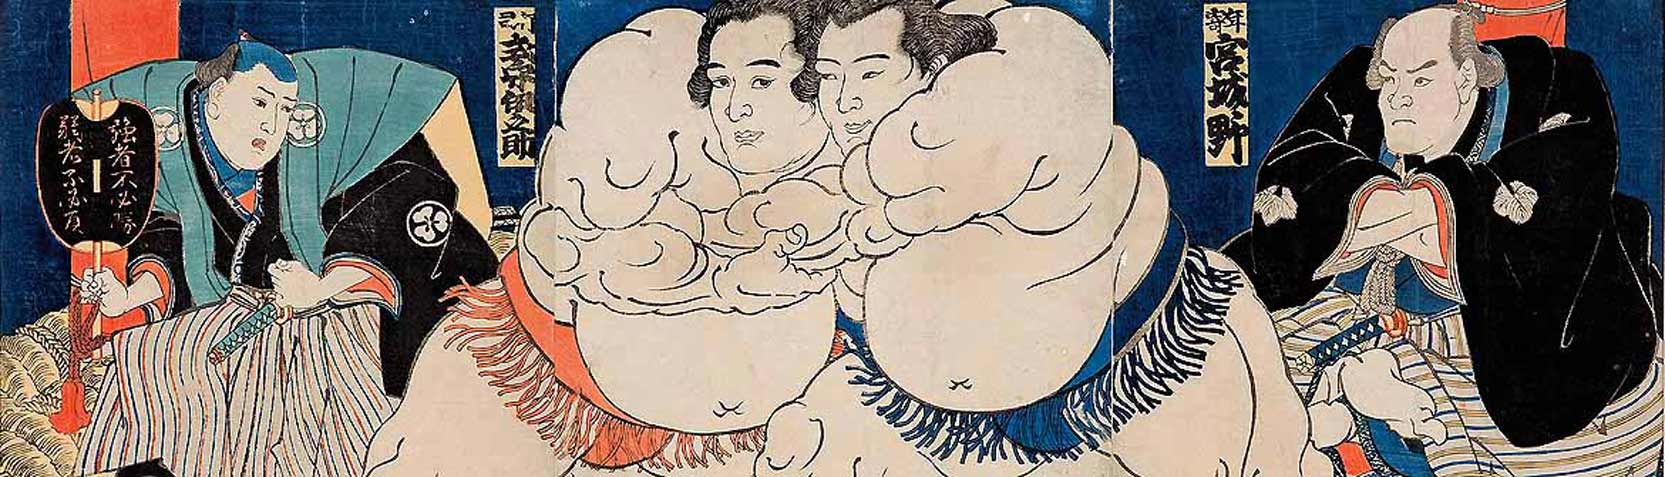 Artists - Utagawa Kuniyoshi